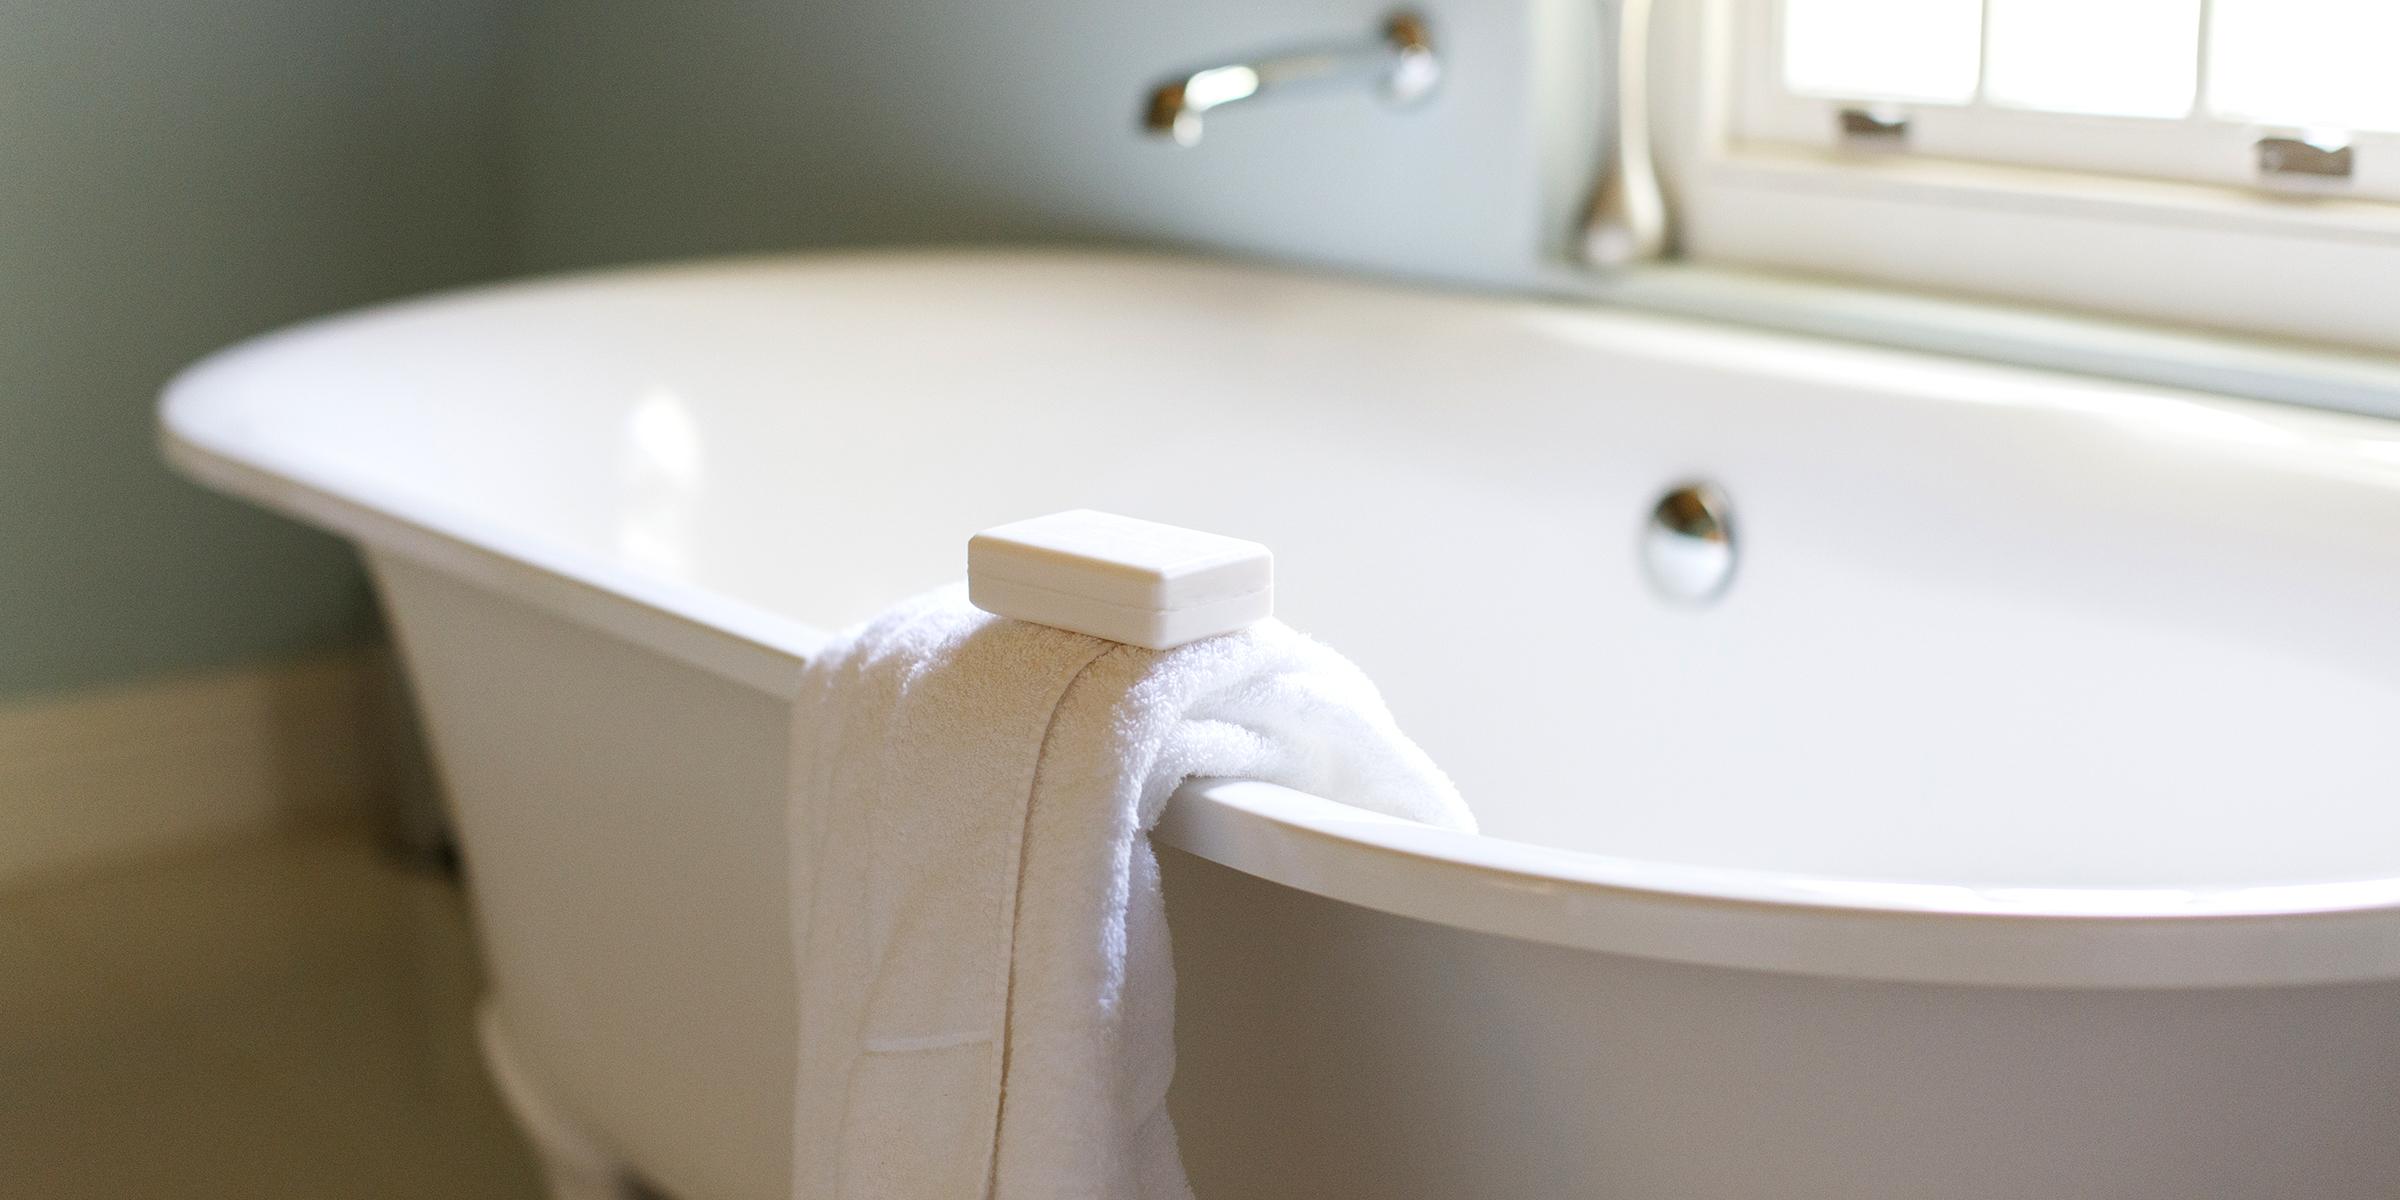 Bye Bye Bathtub Why We Might Be Saying Farewell To Bathtubs